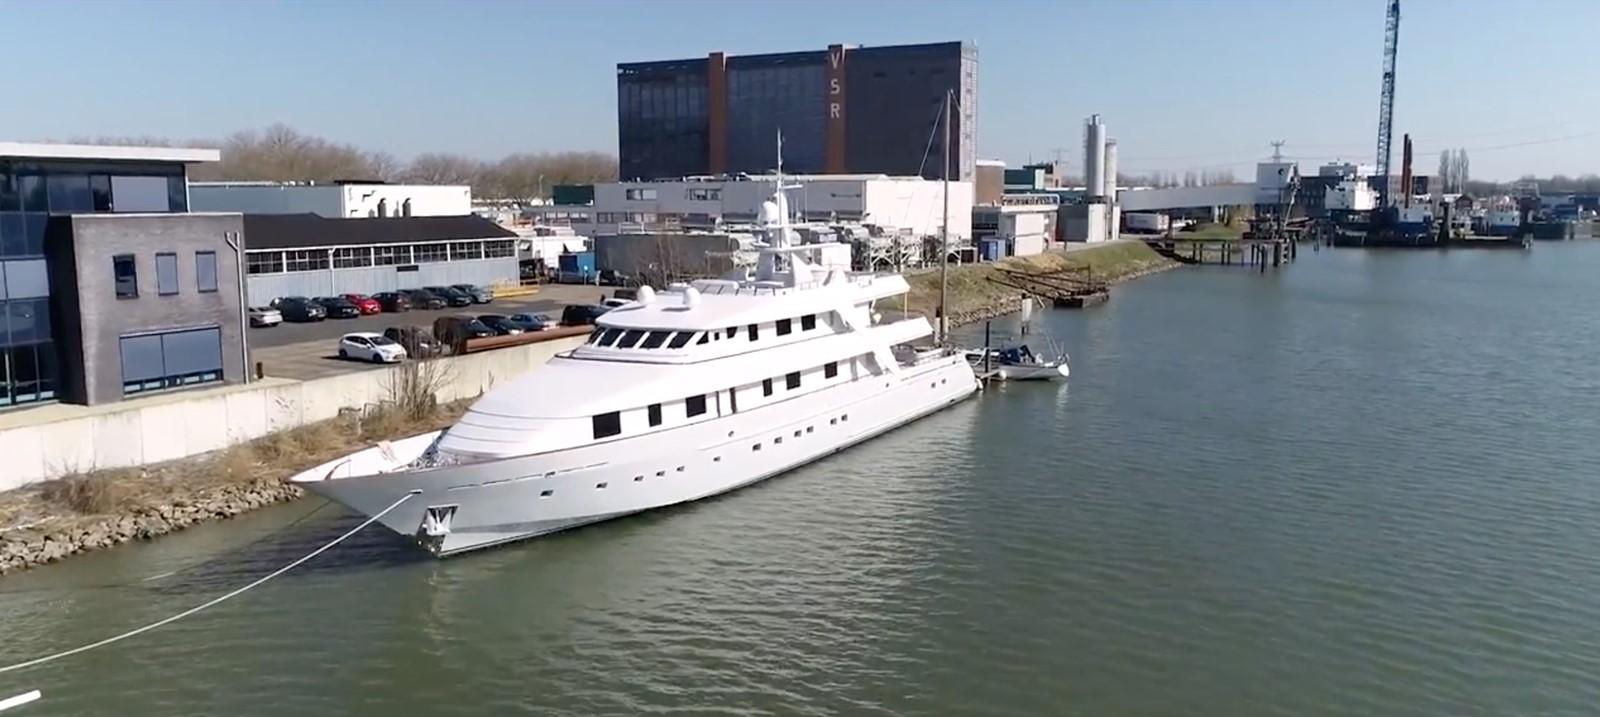 Port Bow Profile - 162 OCEANCO For Sale